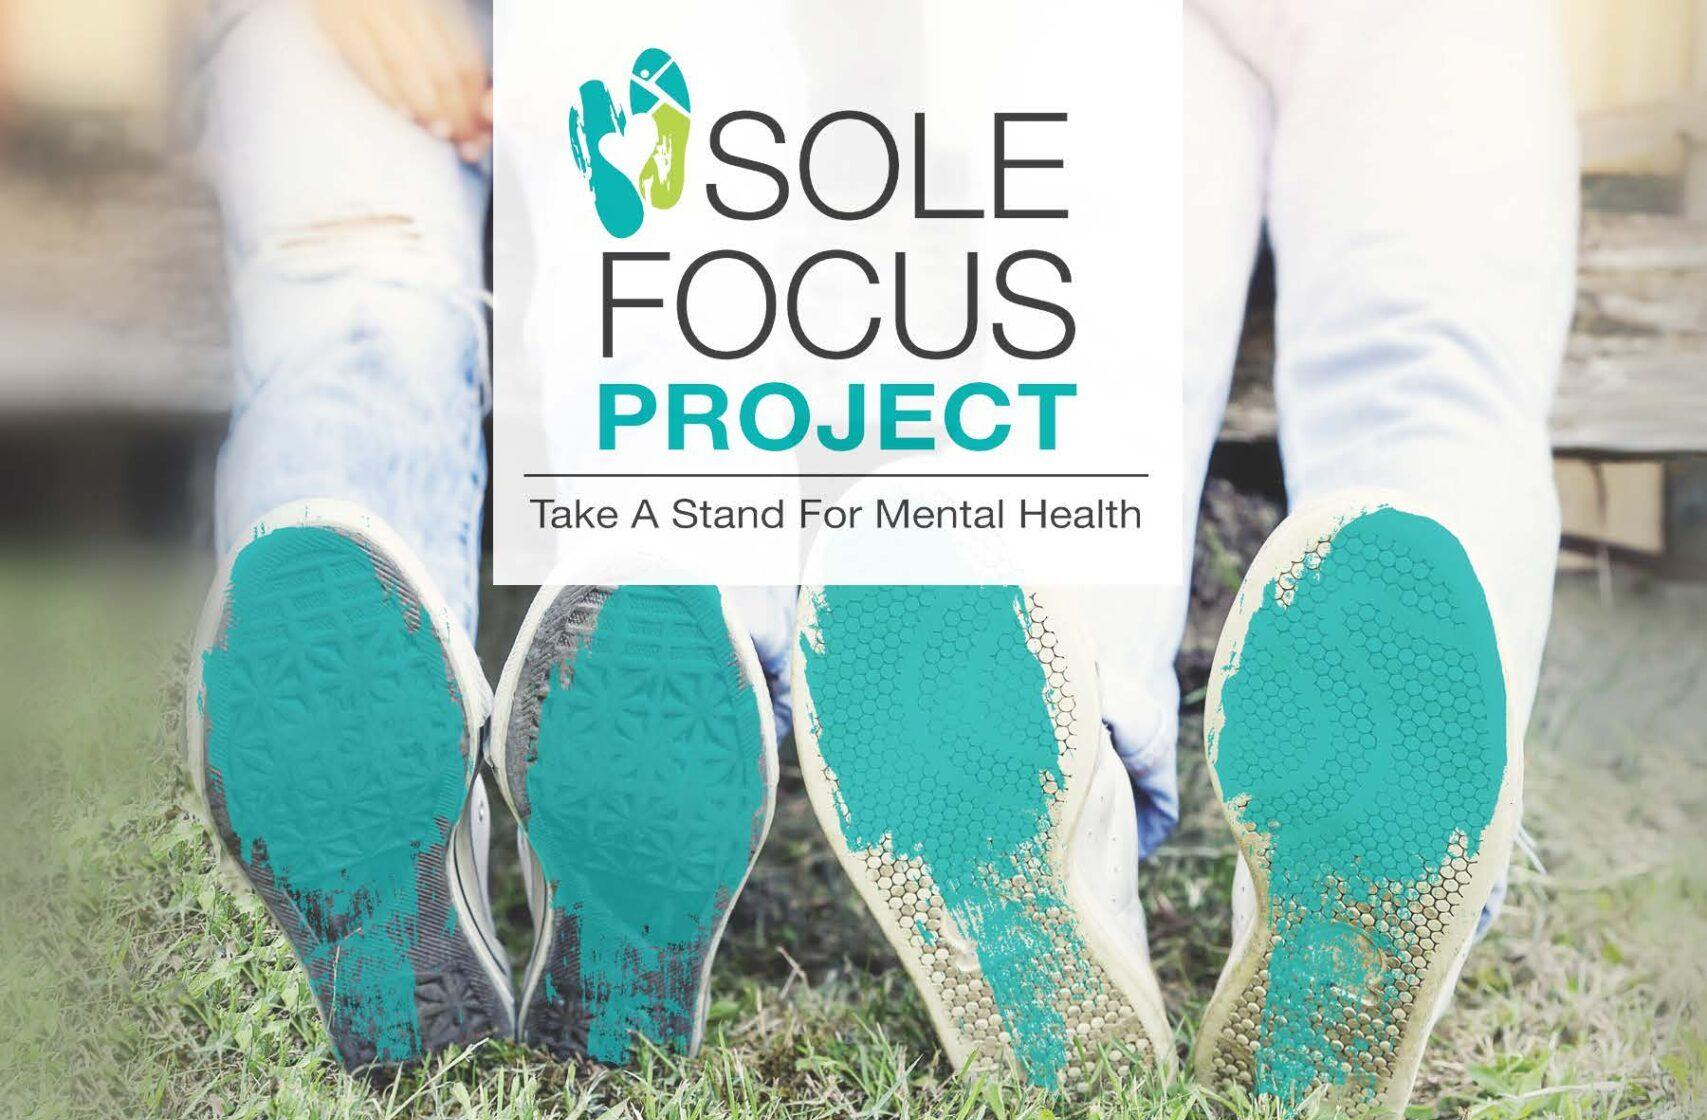 Sole Focus Project shoes